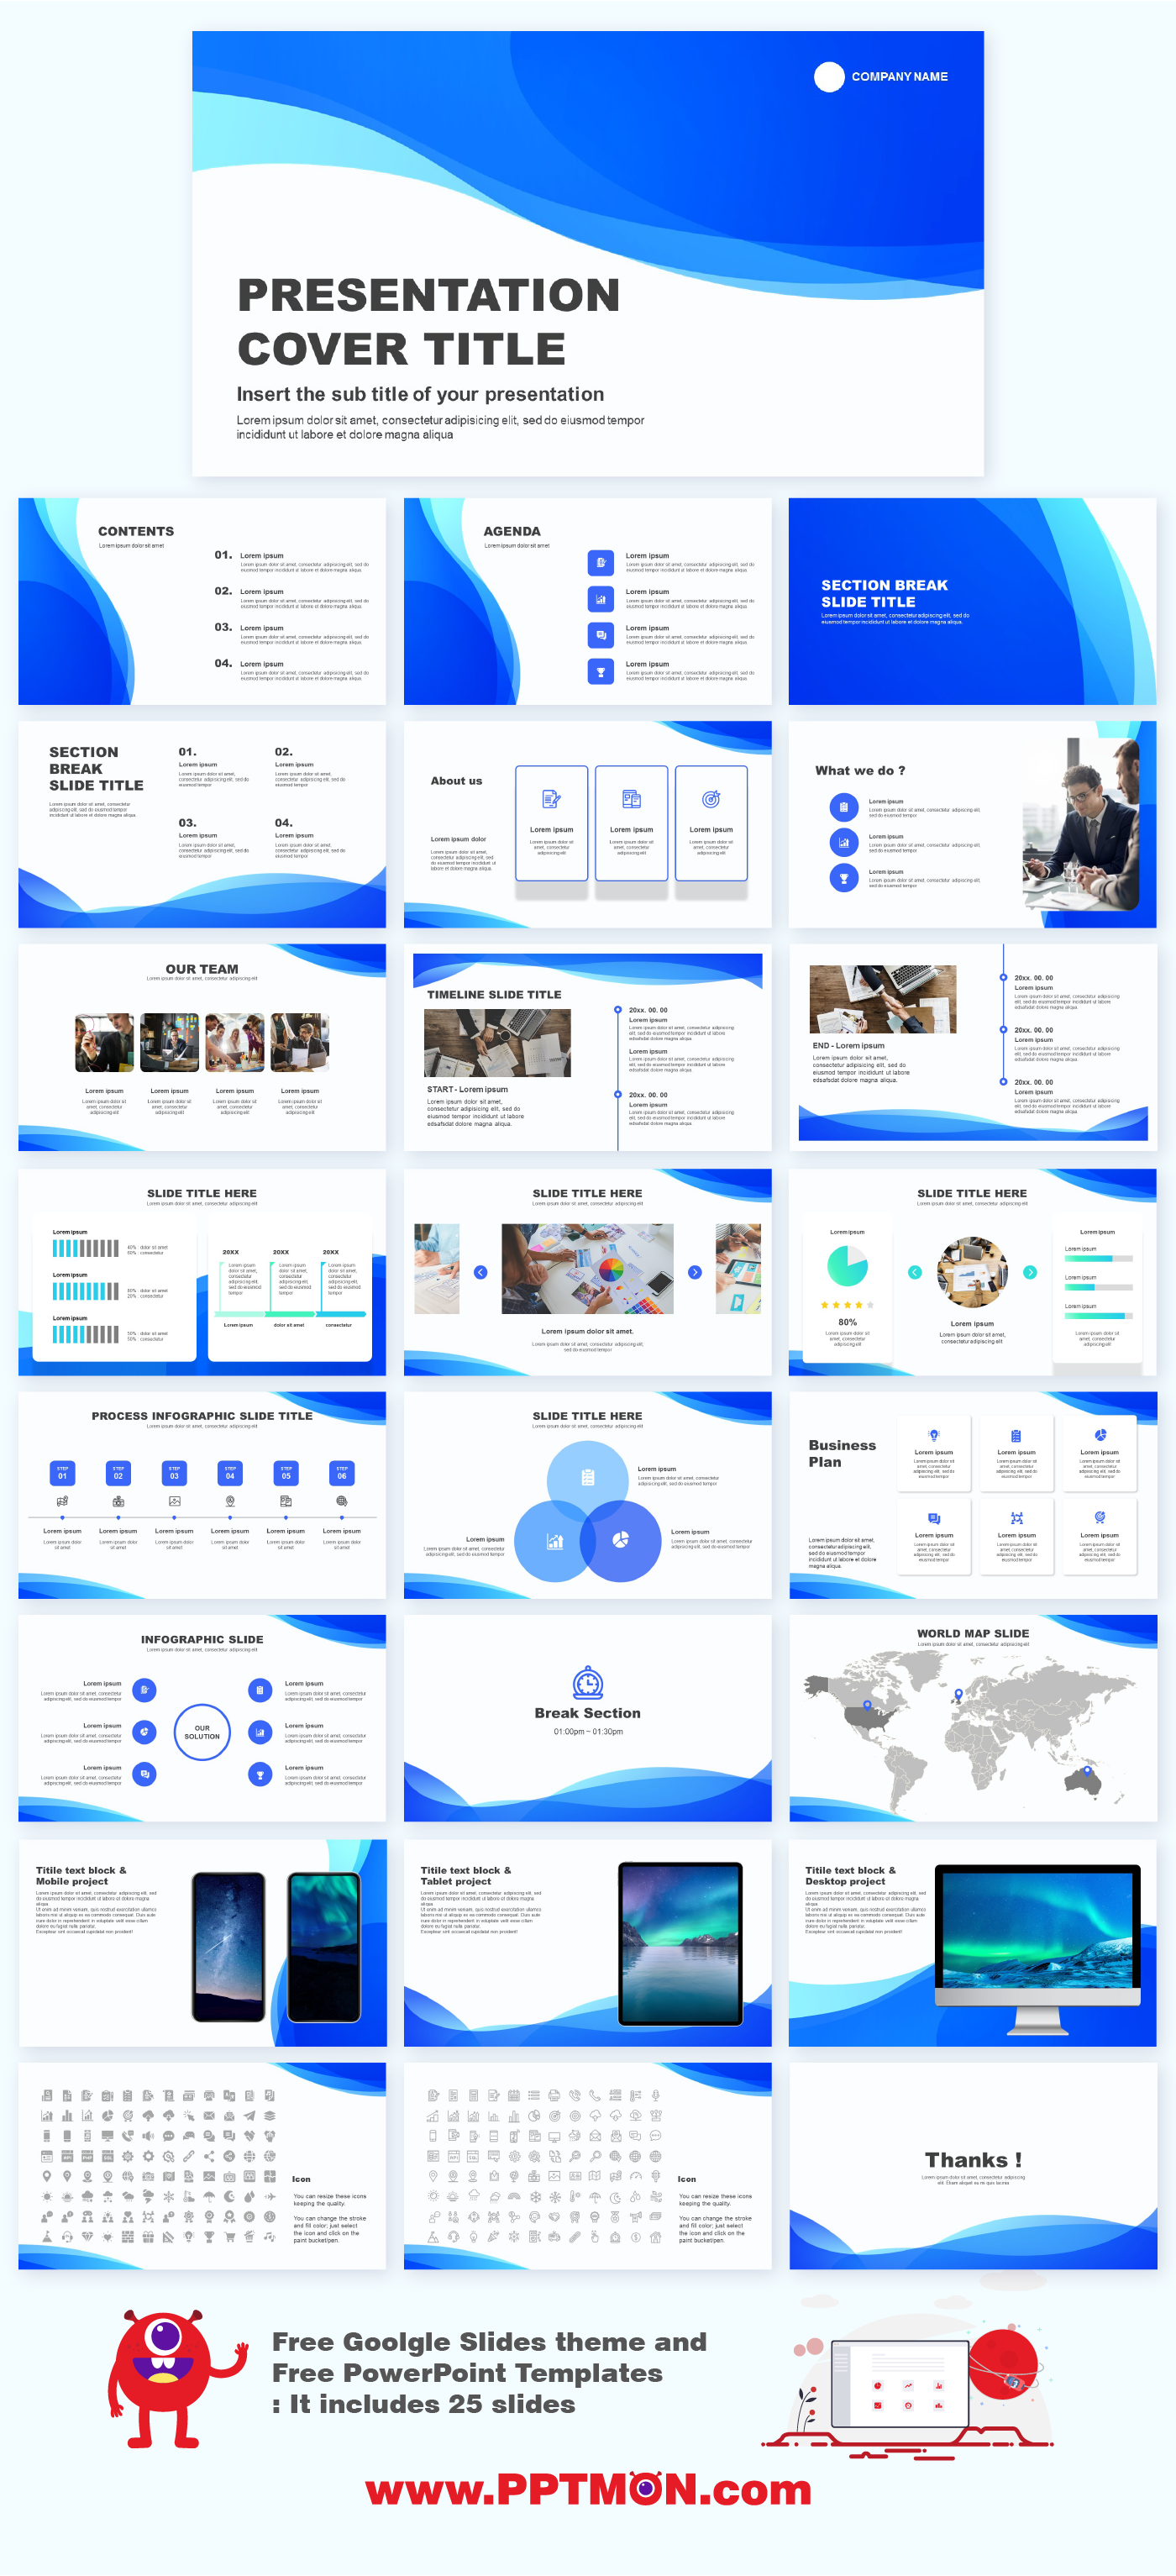 Wave Design Free Presentation Templates Google Slide Theme Powerpoint Templ In 2020 Presentation Template Free Powerpoint Template Free Powerpoint Design Templates